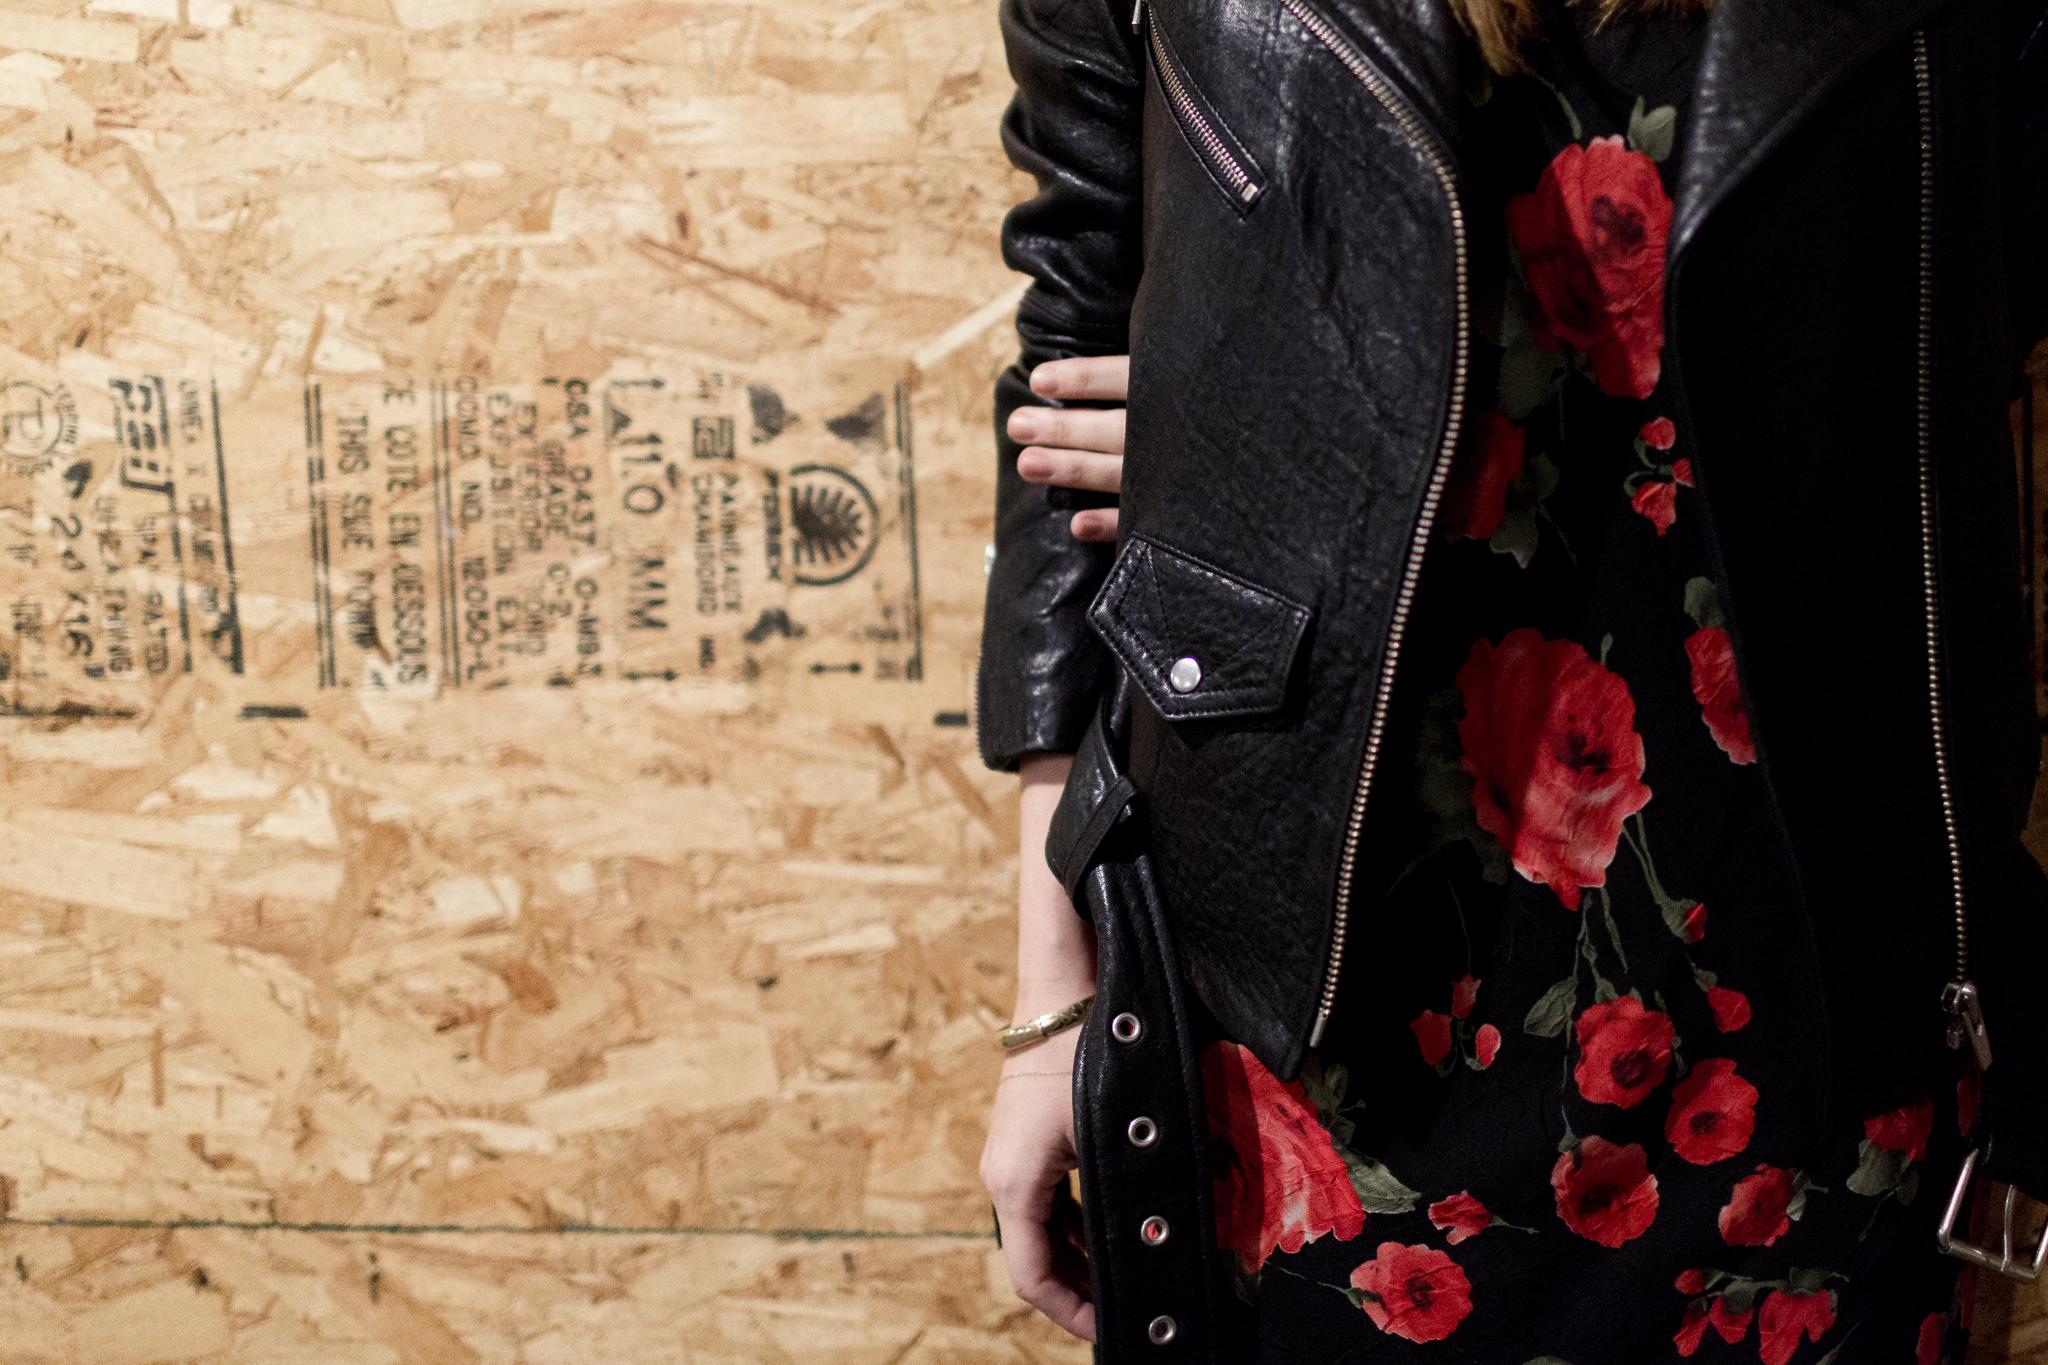 anna_e_cottrell_eldridge_edit_rose_noir_fashion_blogger_vintage_90s_rose maxi_dress_veda_black_leather_jayne_jacket_rag_and_bone_chelsea_boot_styling_mgb_photo_11.jpg